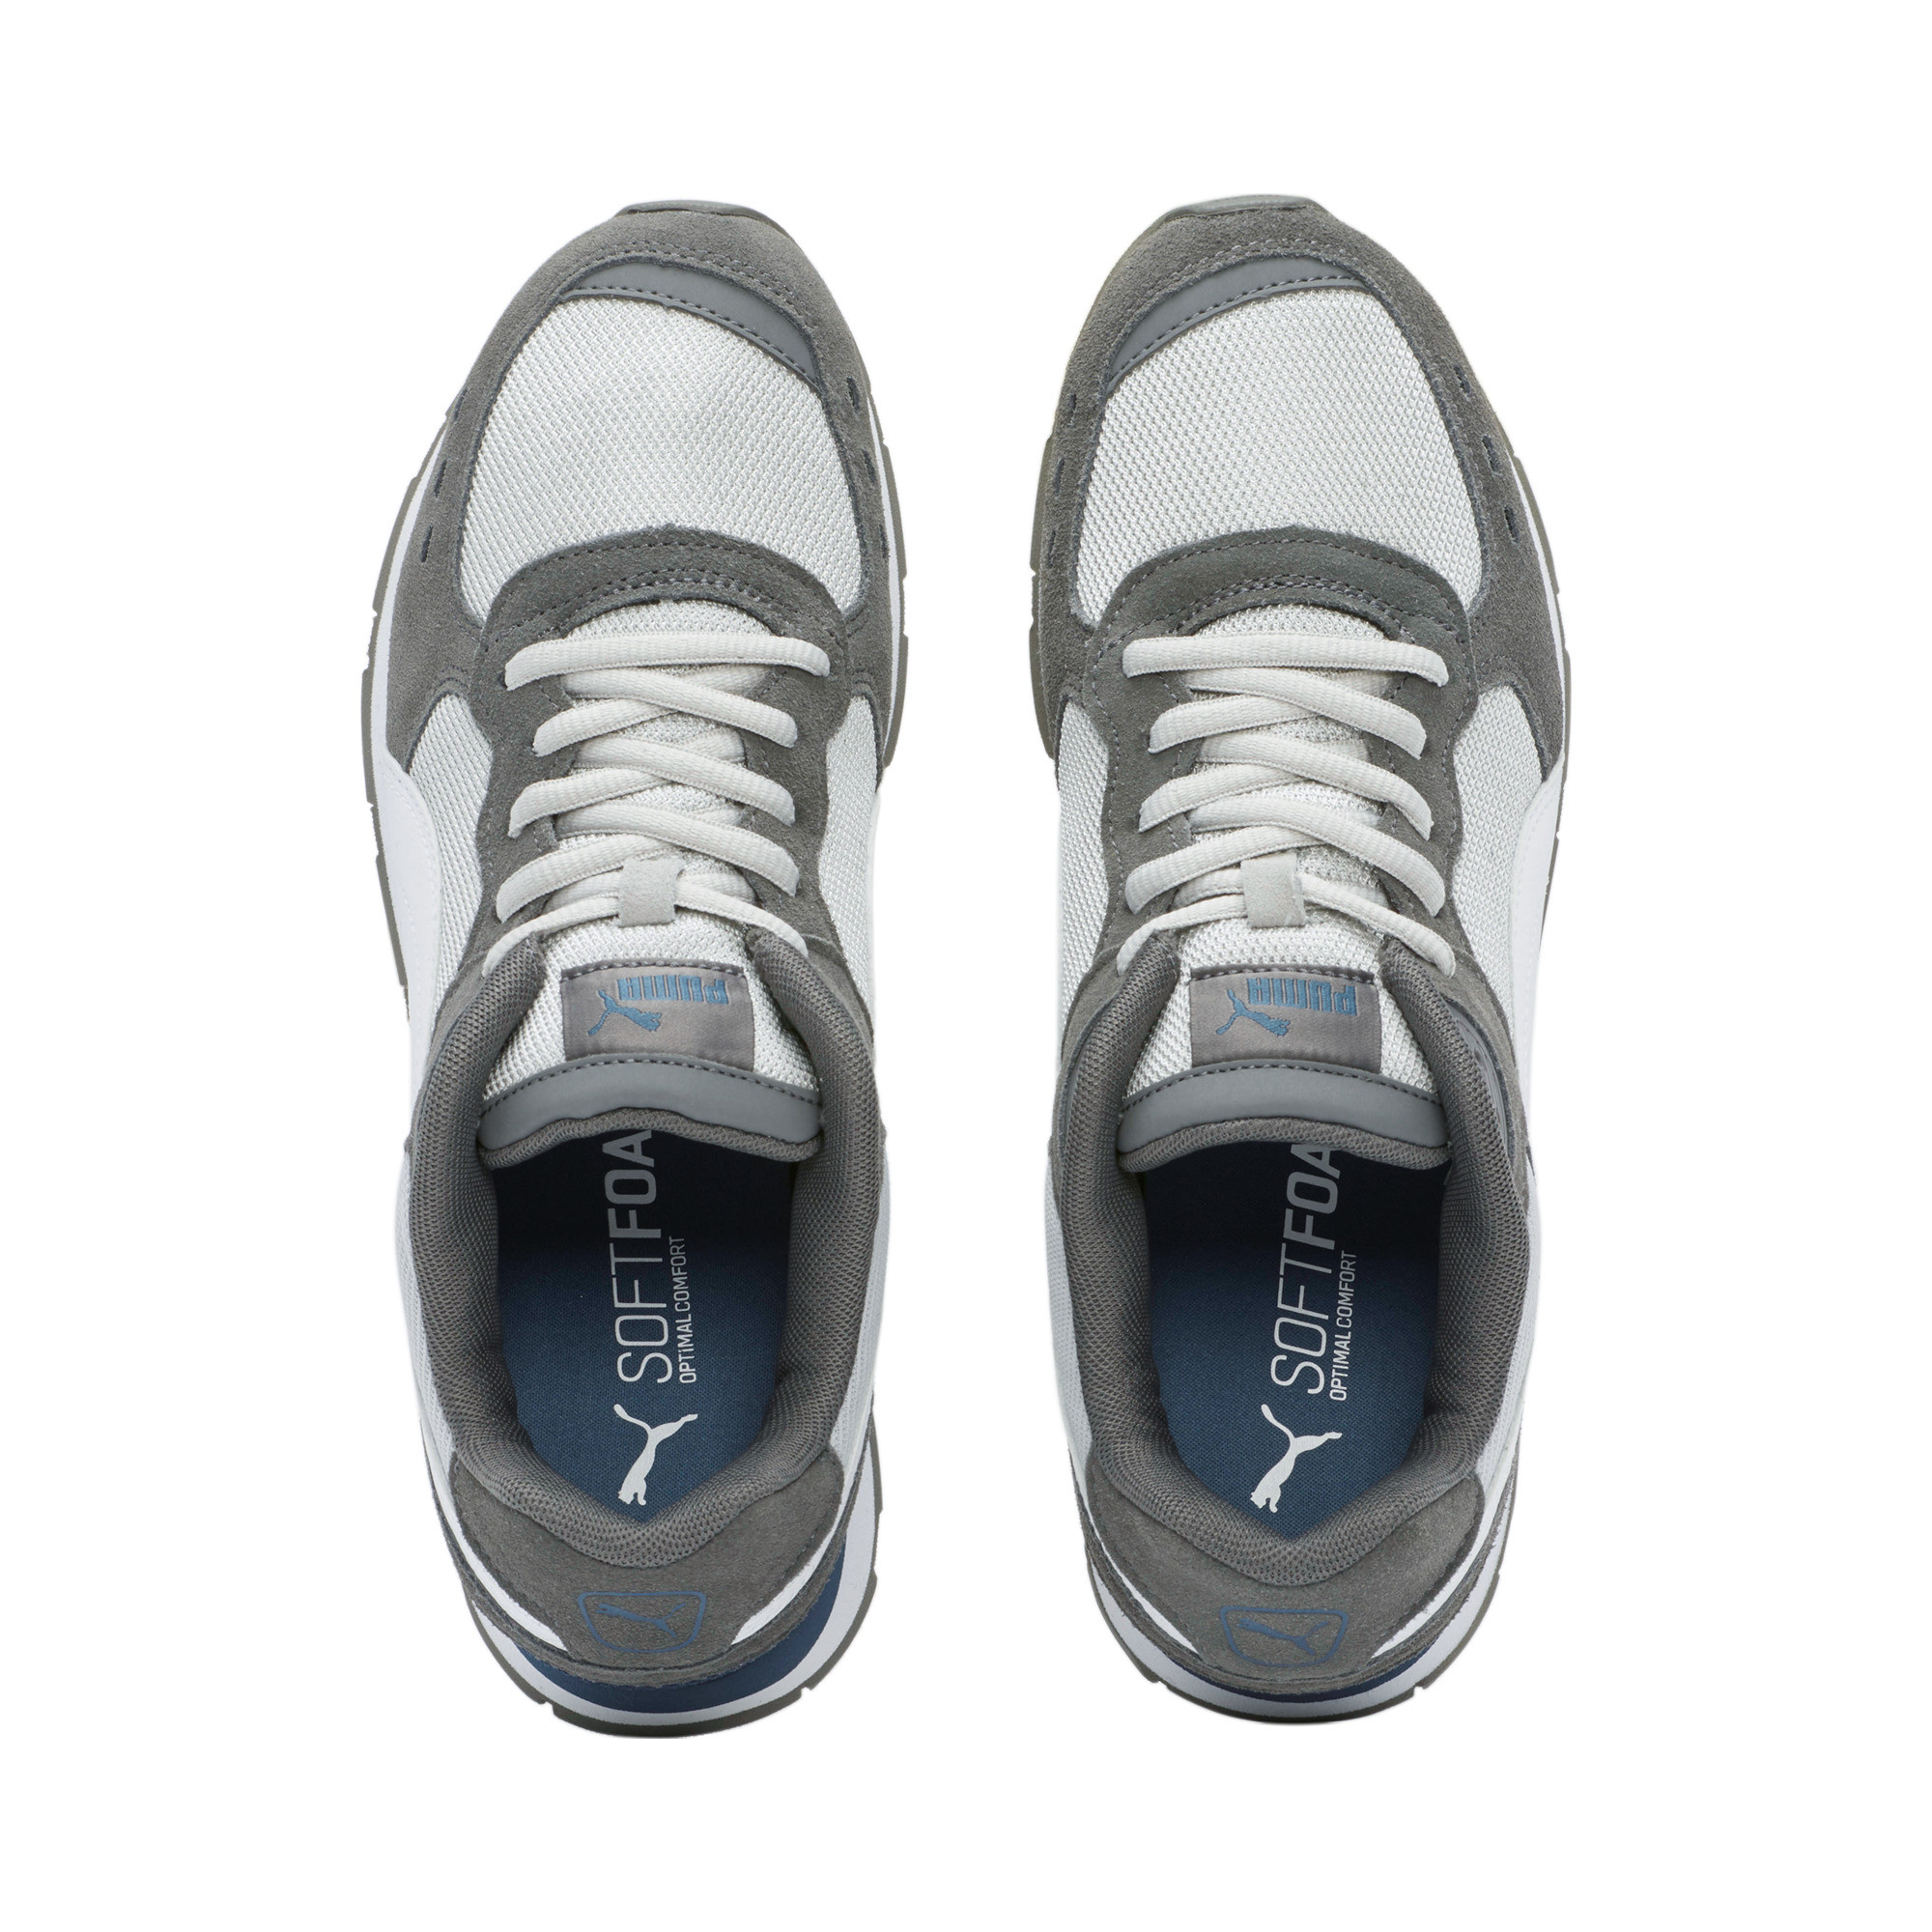 PUMA-Men-039-s-Vista-Sneakers thumbnail 43